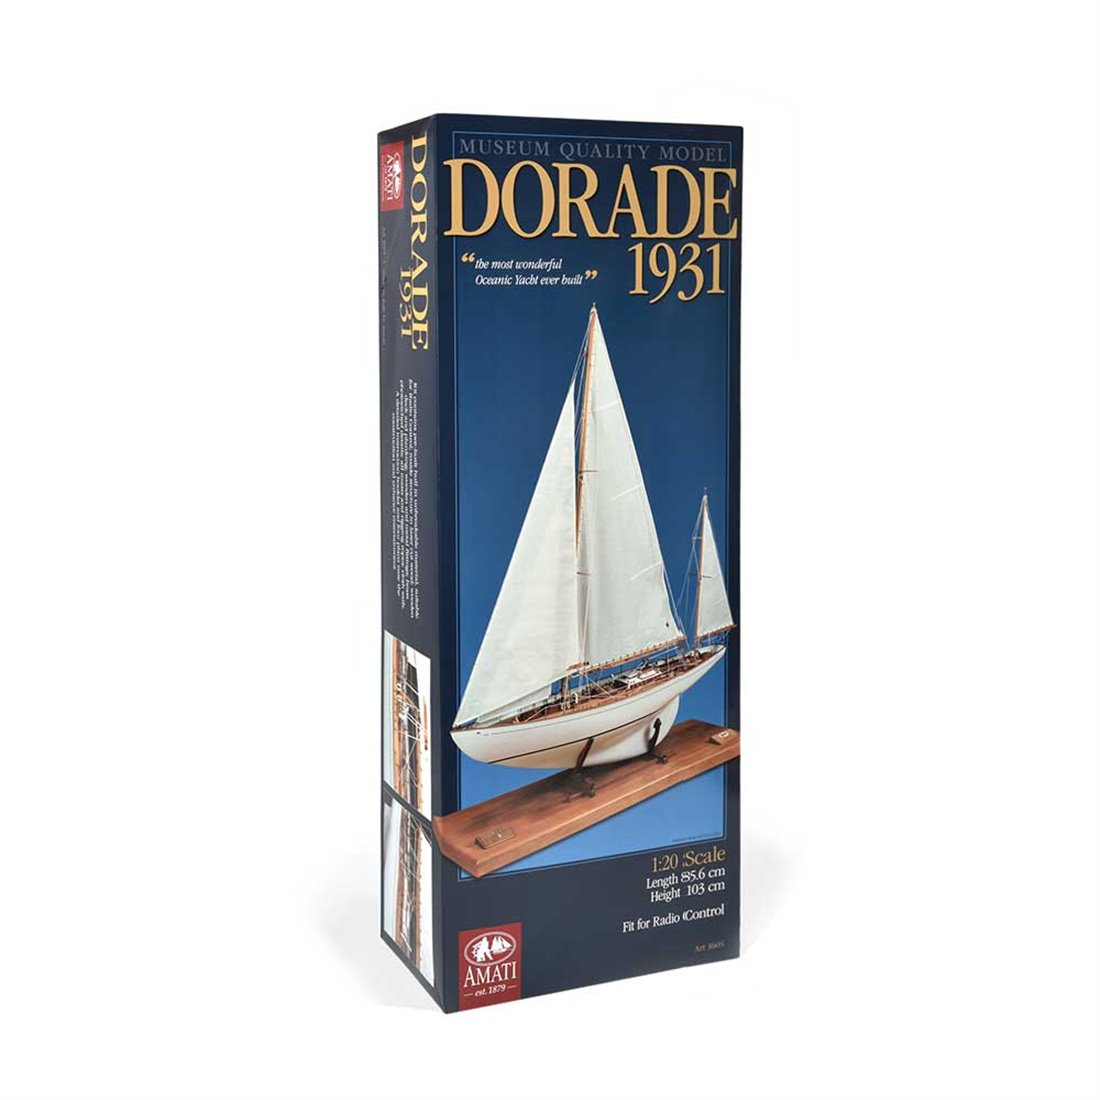 Dorade Racing Yacht